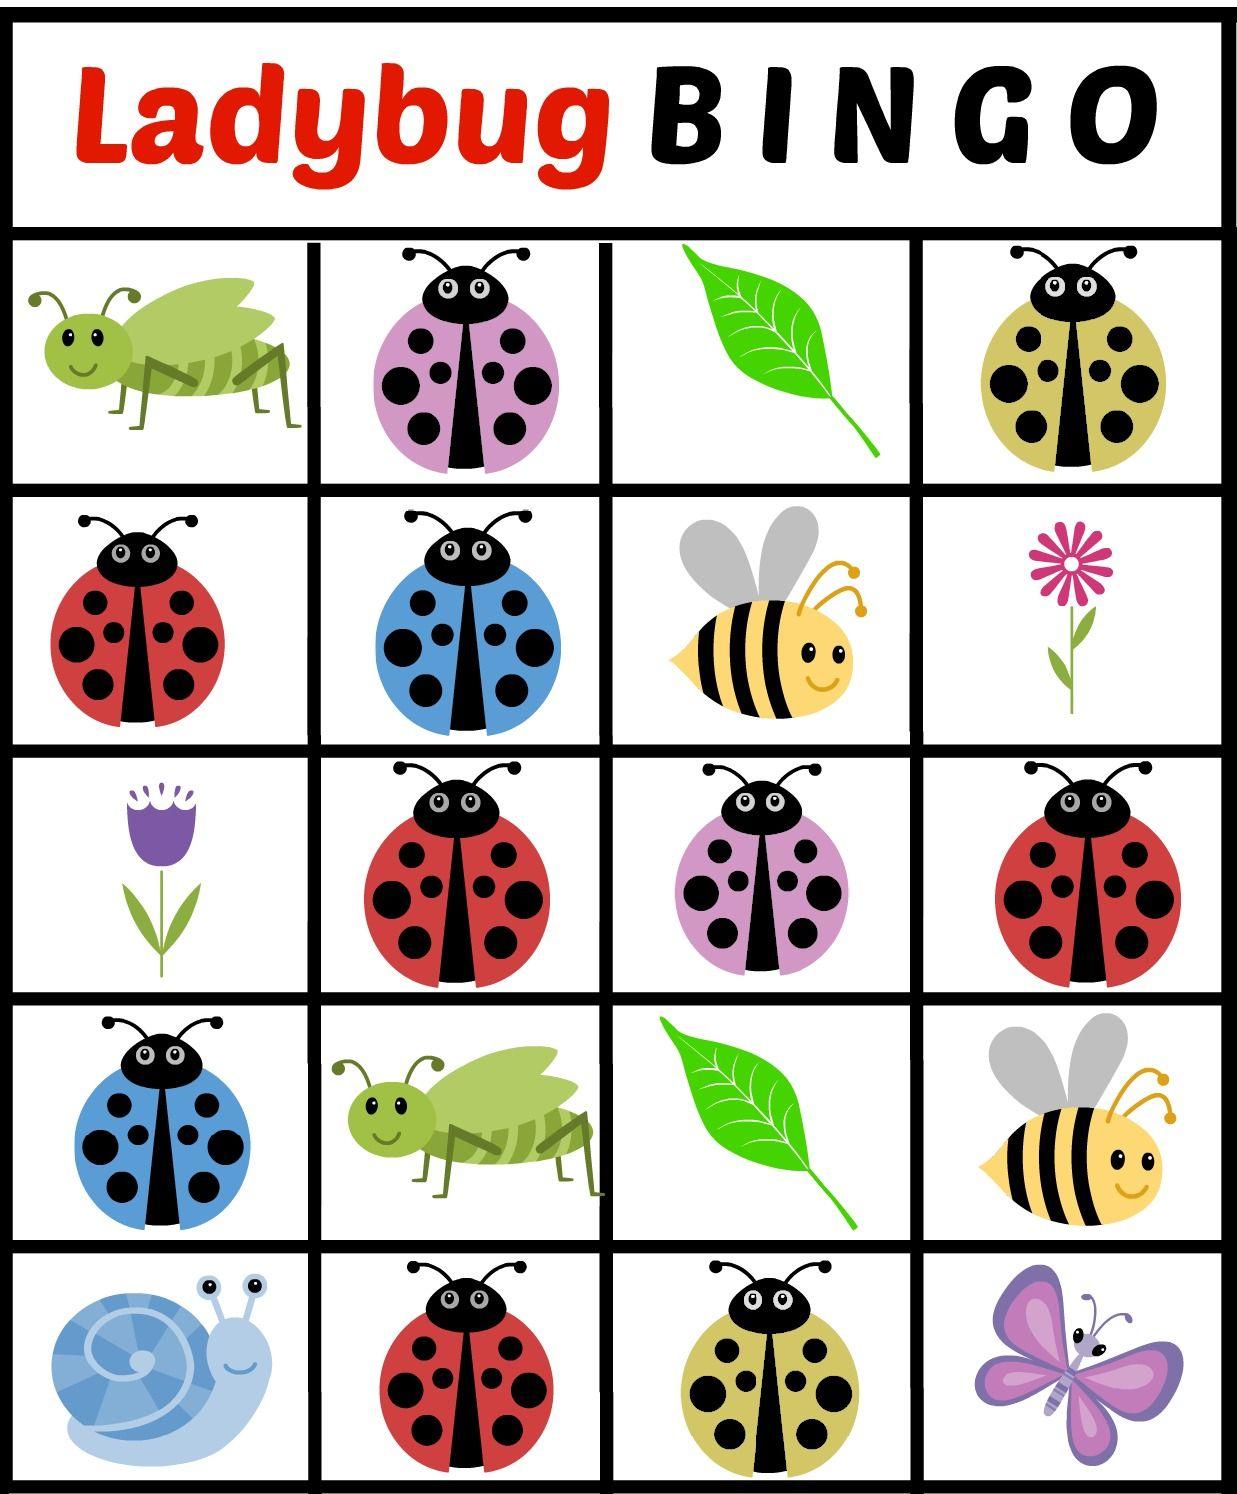 Ladybug Bingo Card 2 - Jenny At Dapperhouse Free Printables